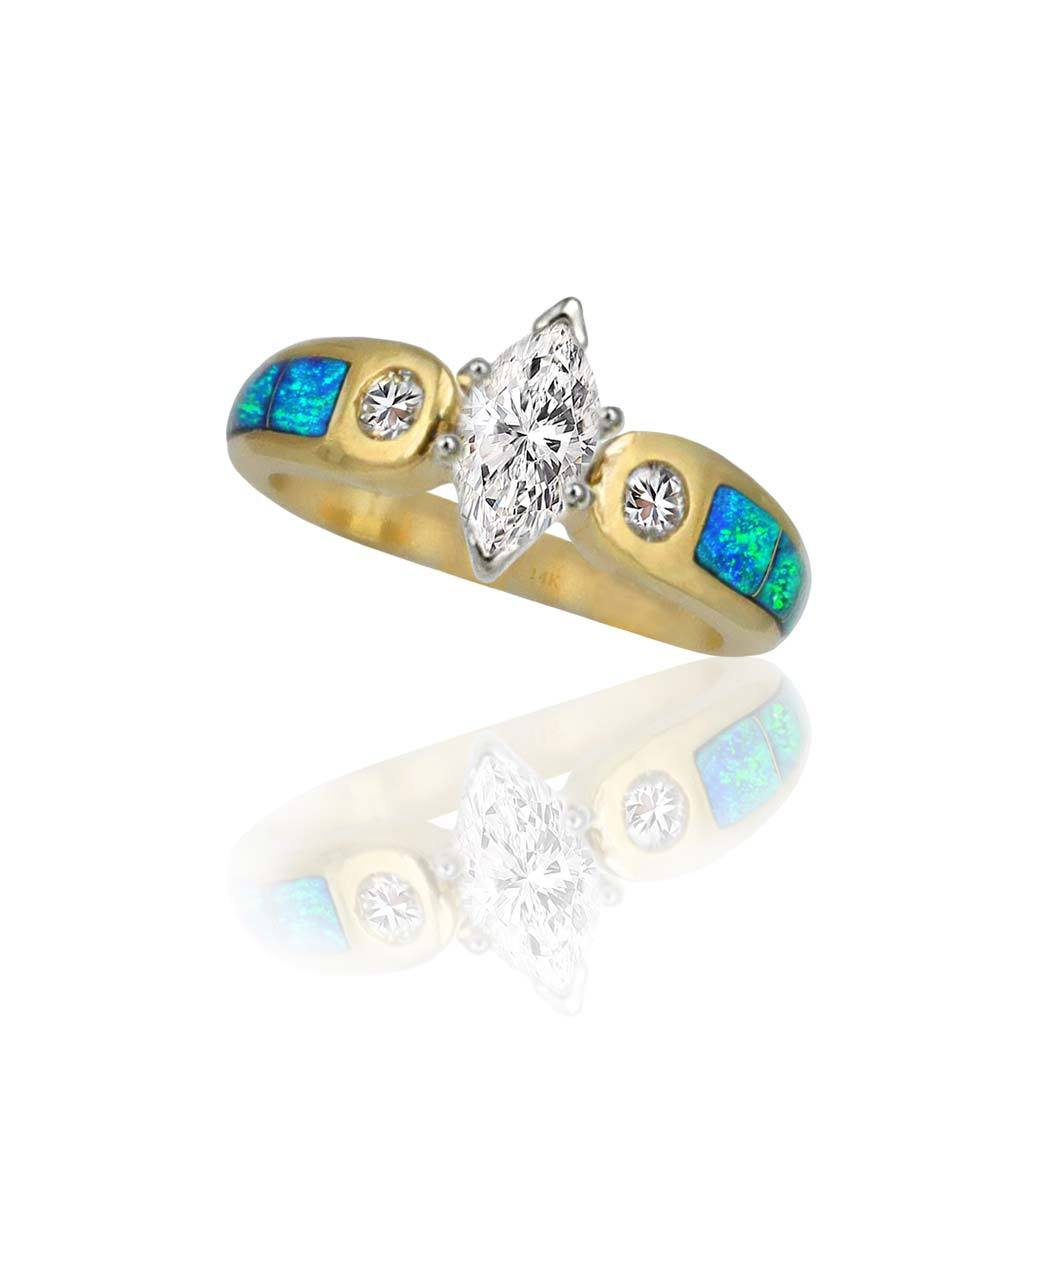 Maverick's 14K Opal Inlay Band With Marquise Center Diamond